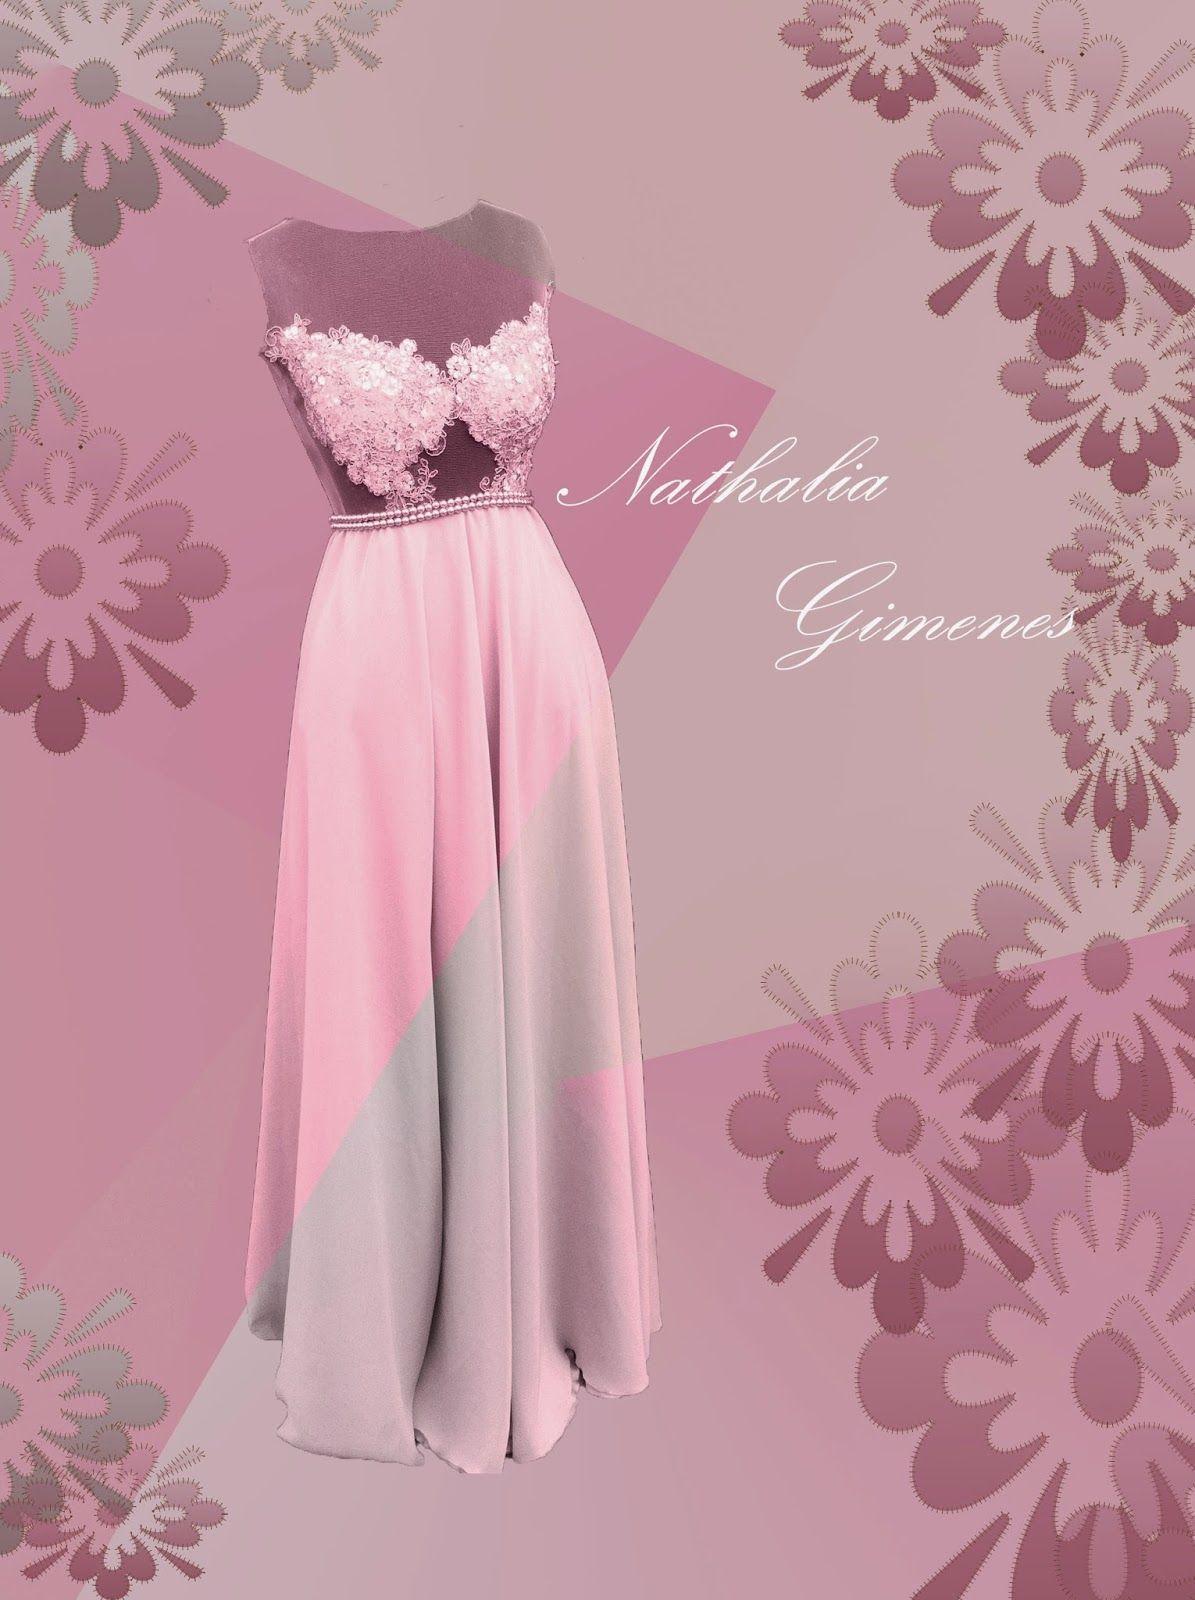 Vestido de Festa - Dress by Nathalia Gimenes